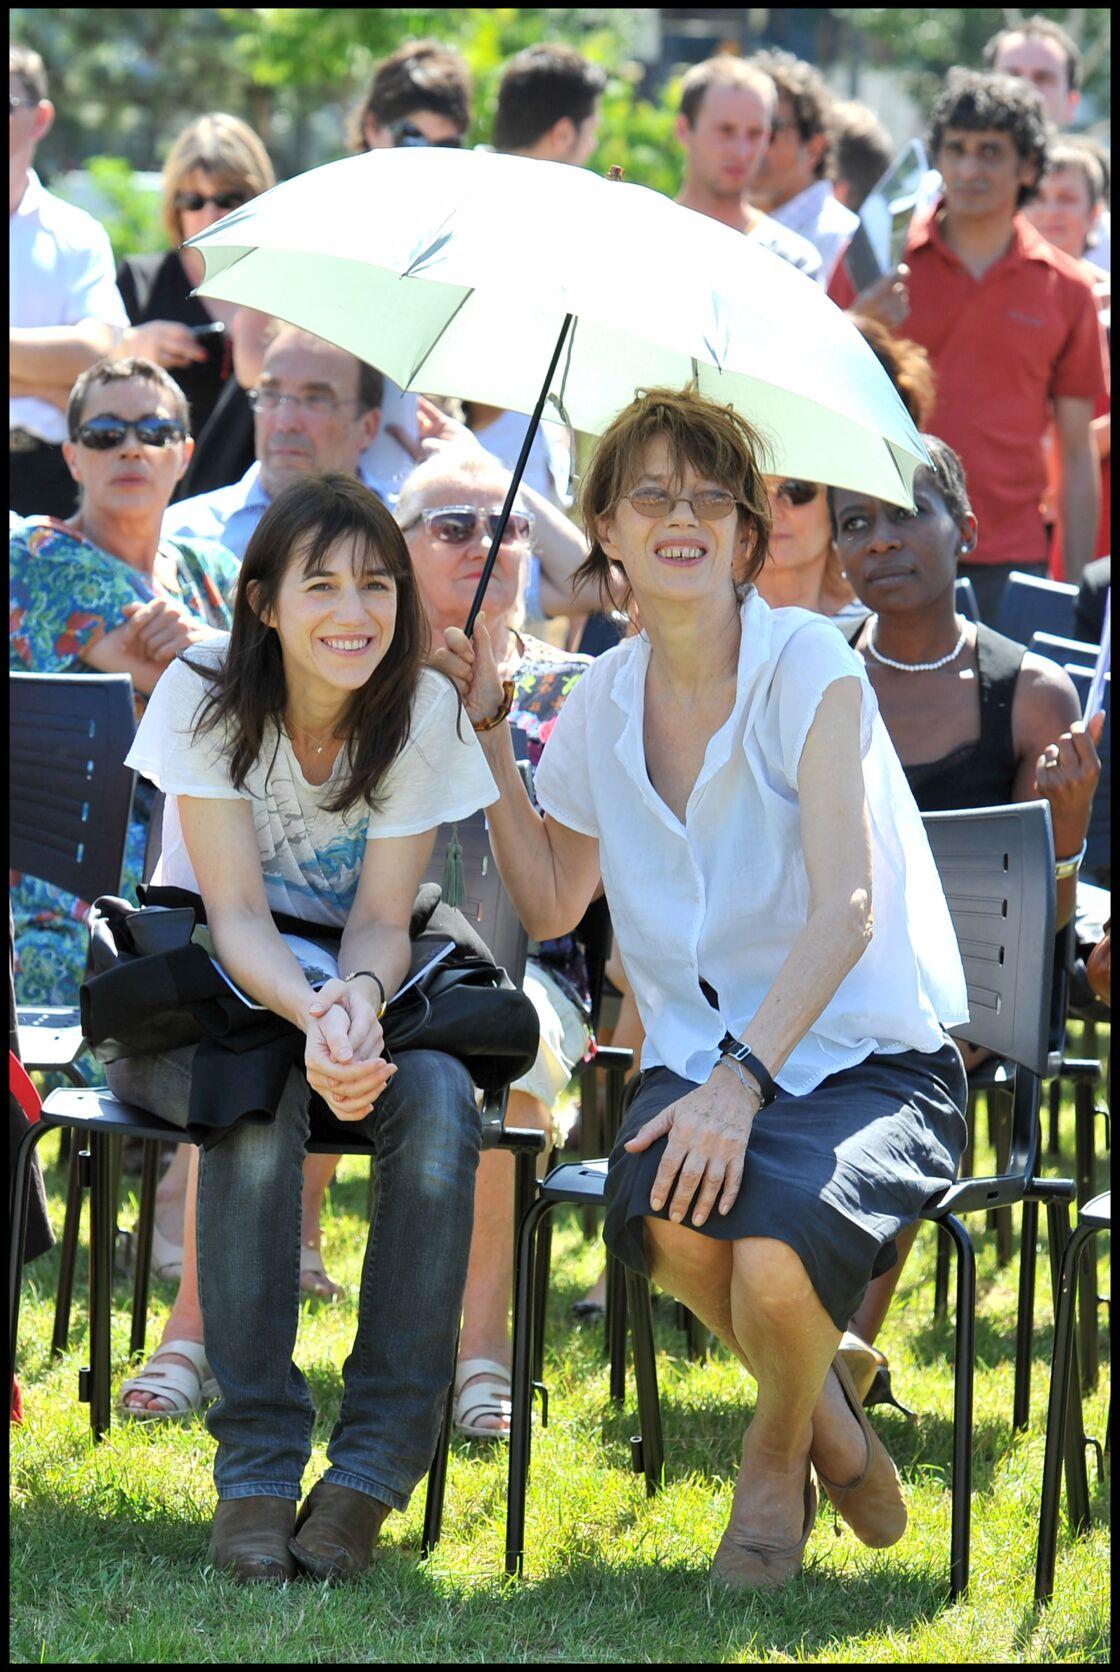 Jane Birkin et Charlotte Gainsbourg lors de l'inauguration du jardin Serge Gainsbourg, porte des Lilas, en juillet 2010